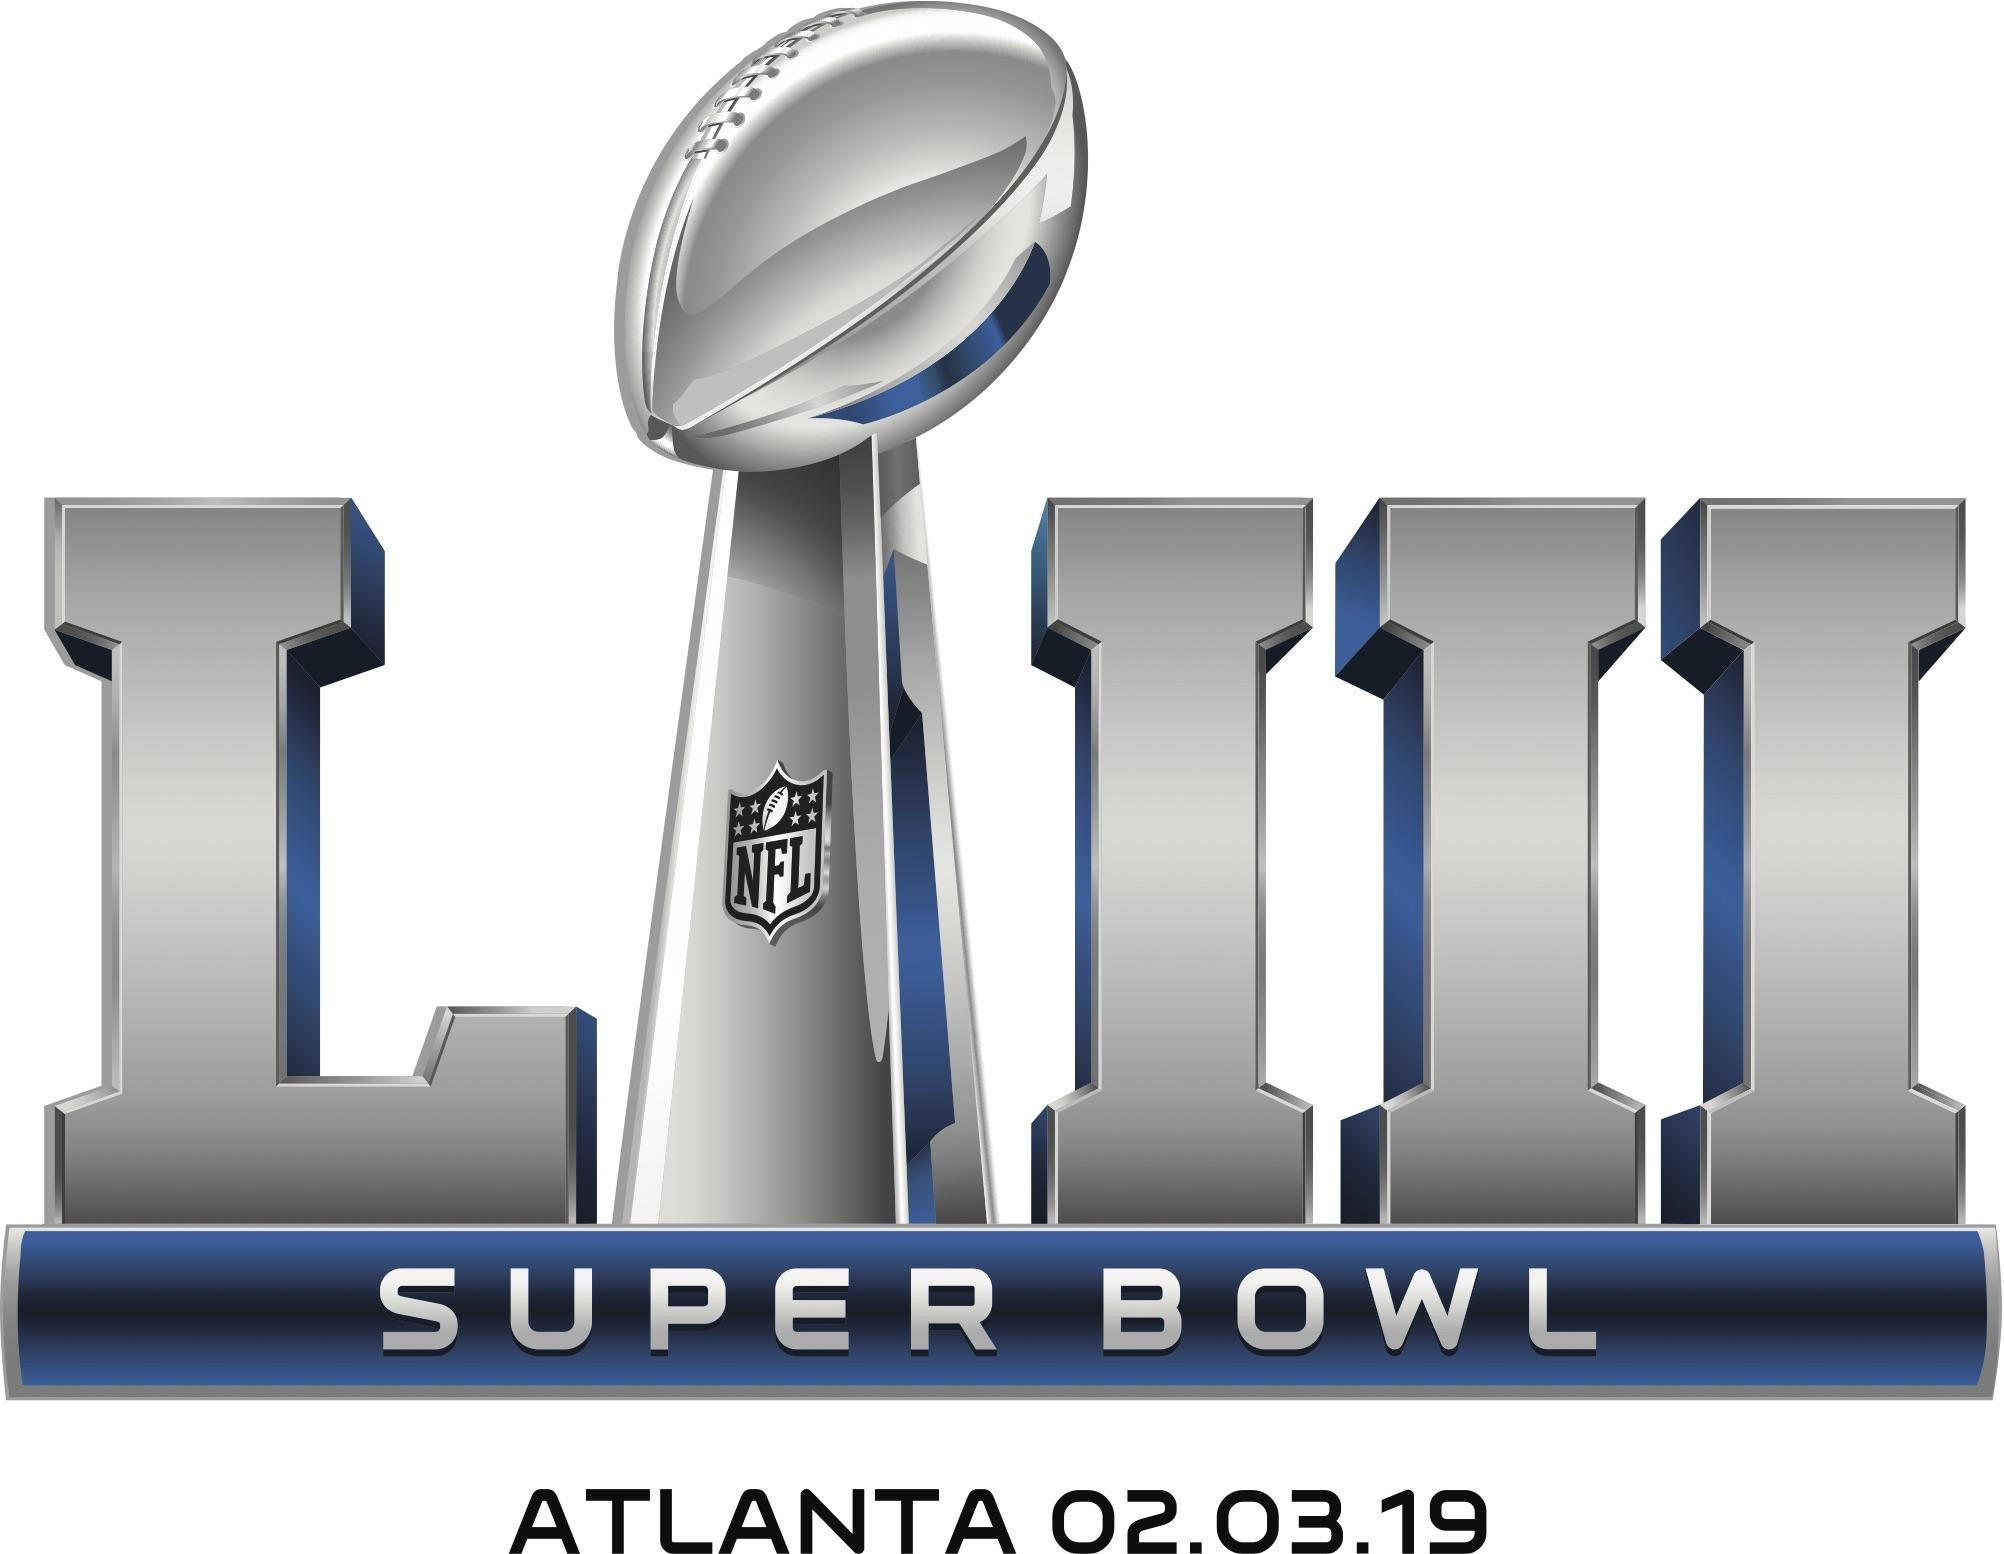 El logo del Super Bowl LIII corresponde a una fórmula similar desde la quincuagésima edición; muestra al trofeo Vincent Lombardi en primer plano.